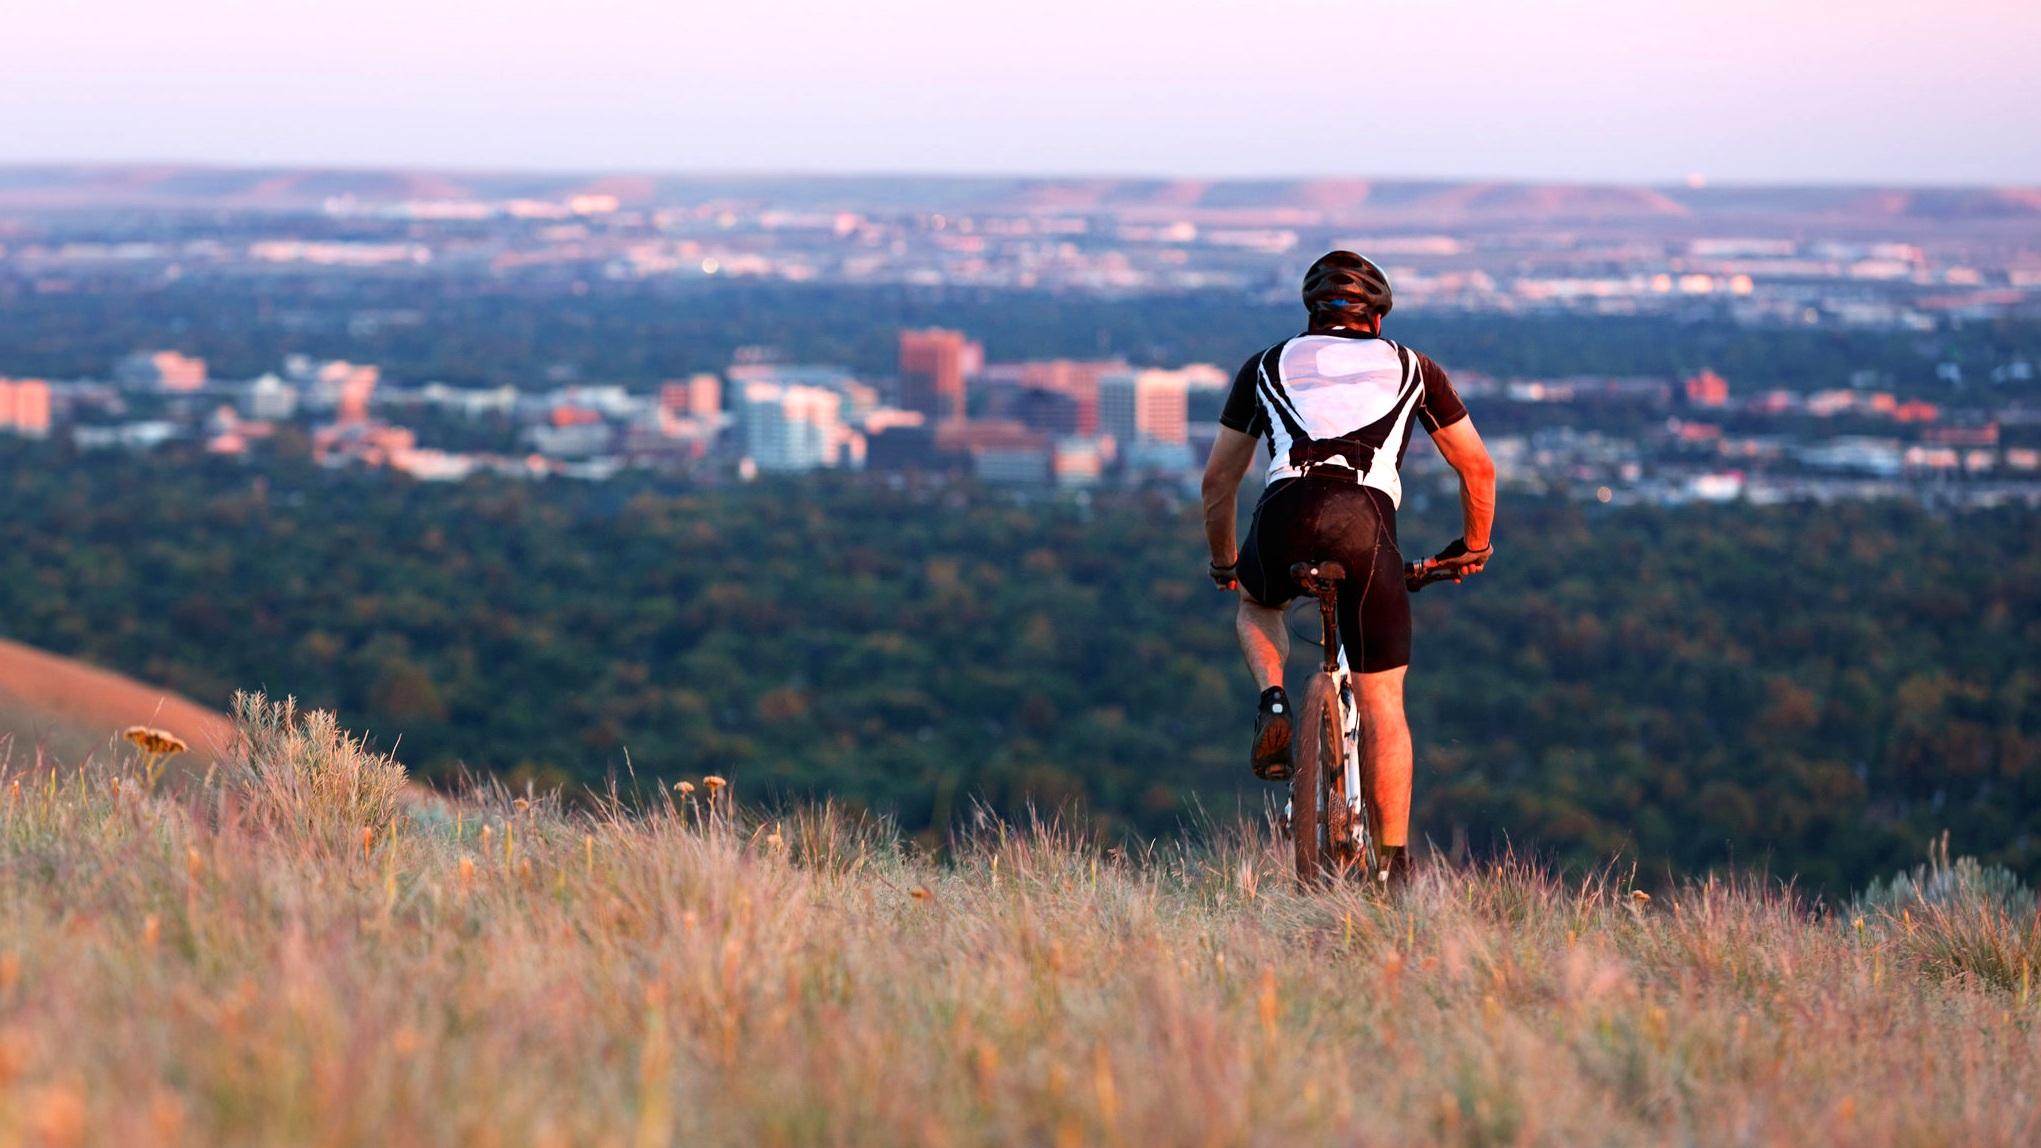 Foothills+Mountain+Biker.jpg